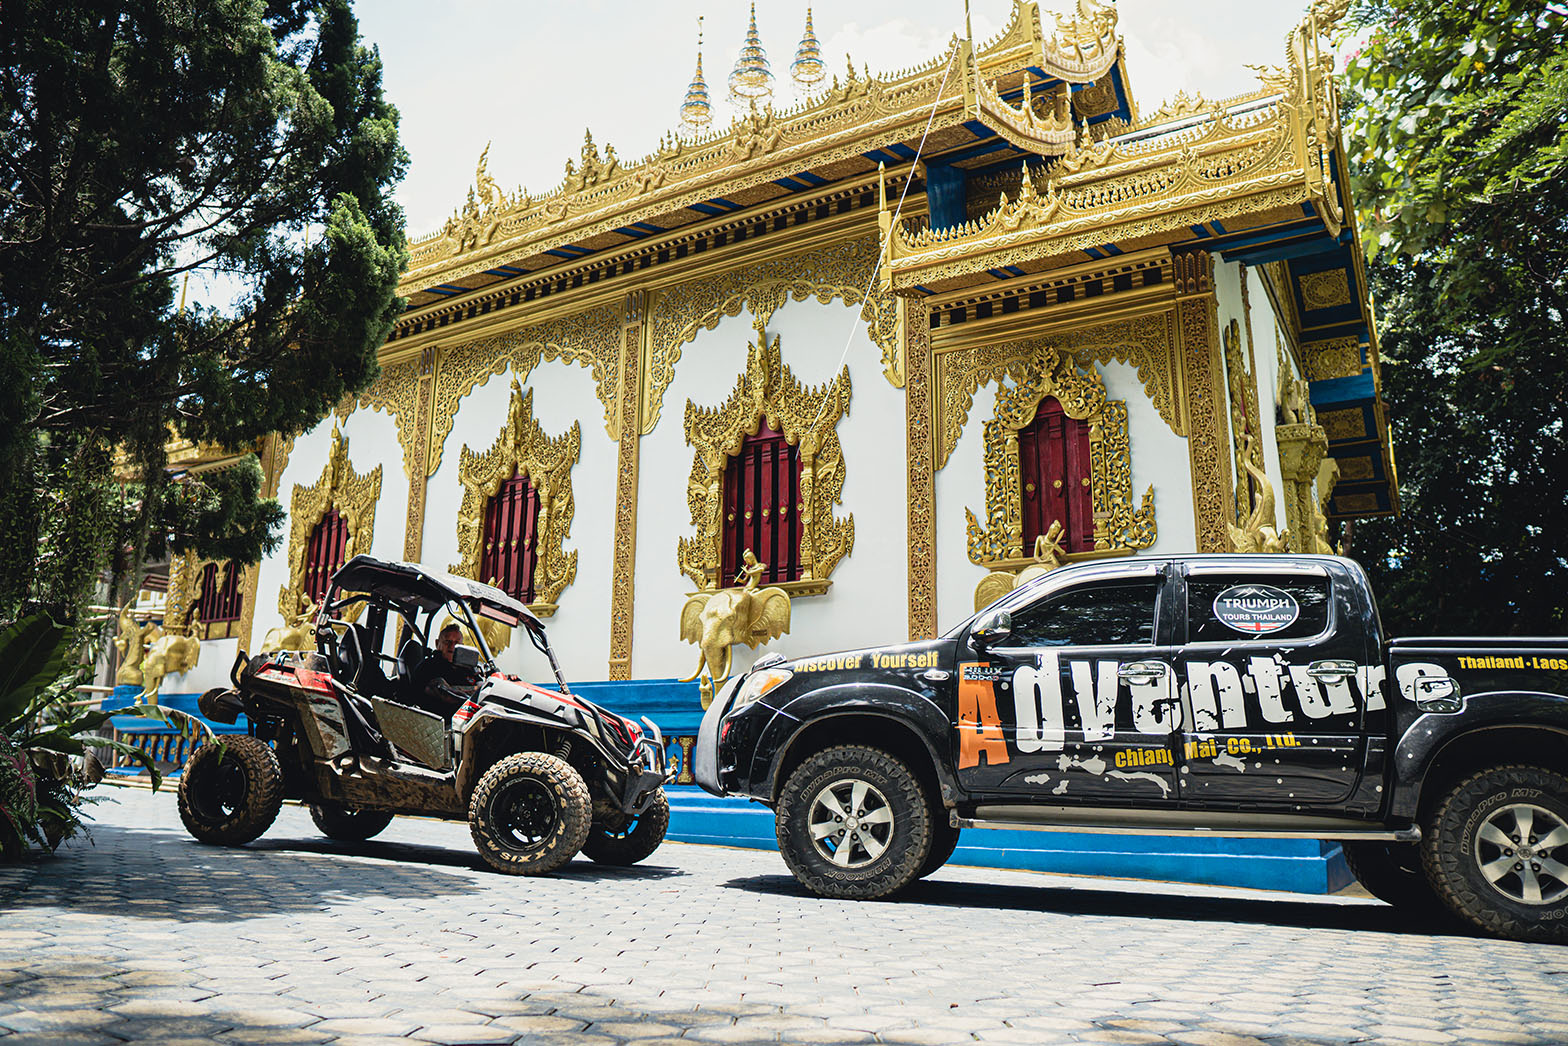 TBT 0060 4x4 thai bike tours 0110